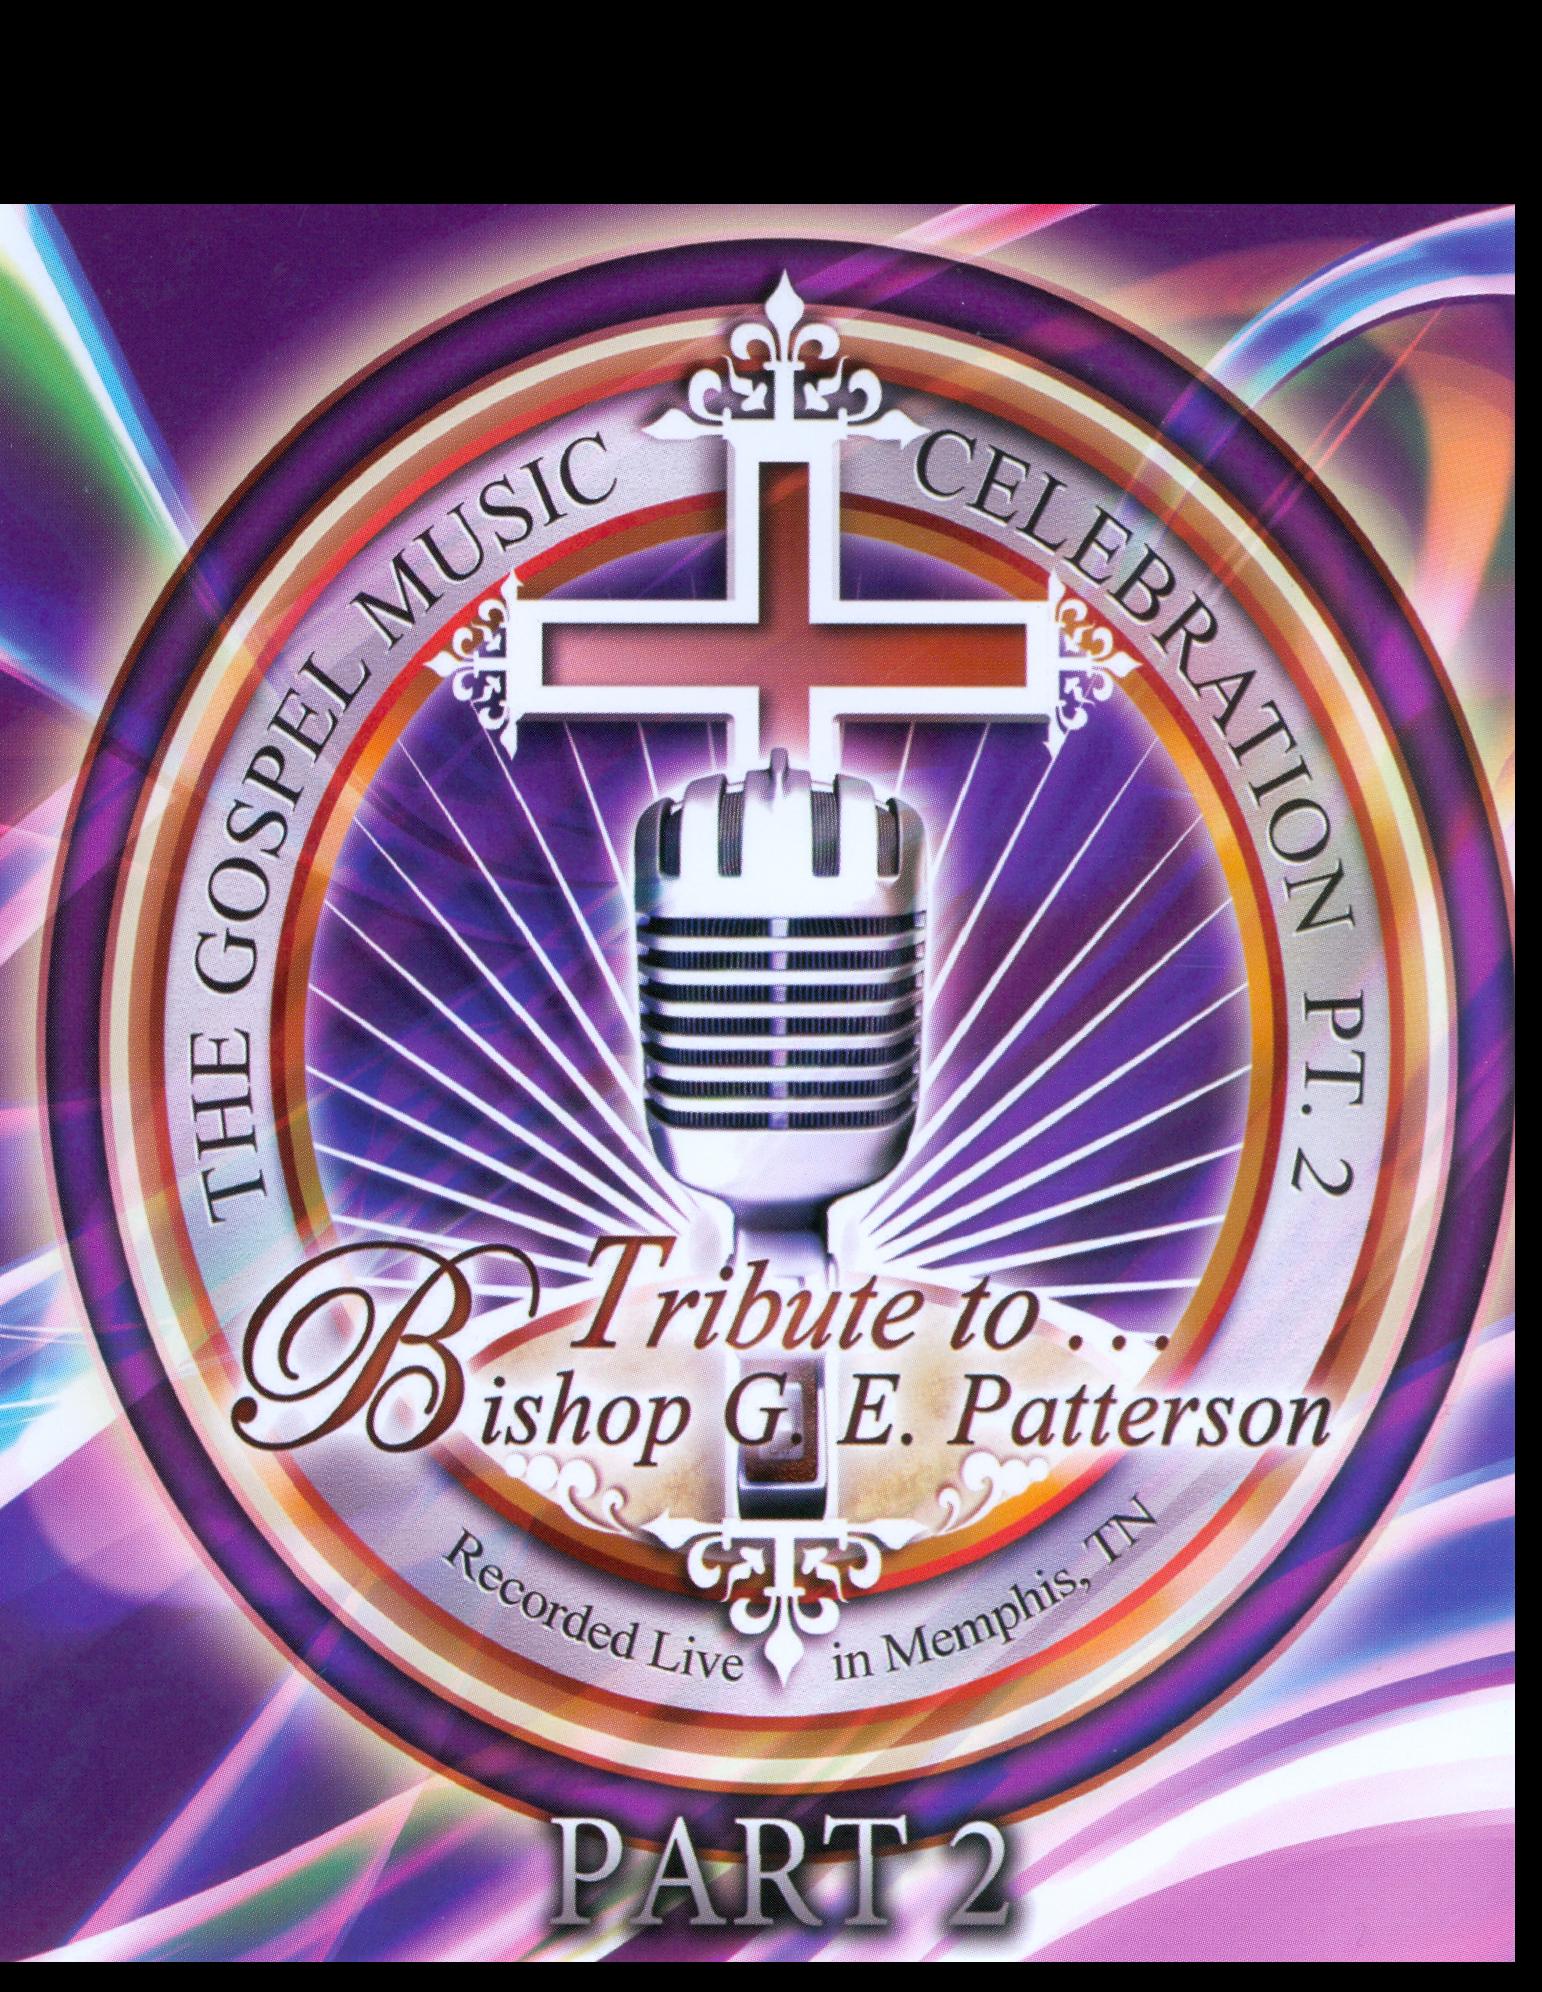 The Gospel Music Celebration, Pt. 2: Tribute to Bishop G.E. Patterson